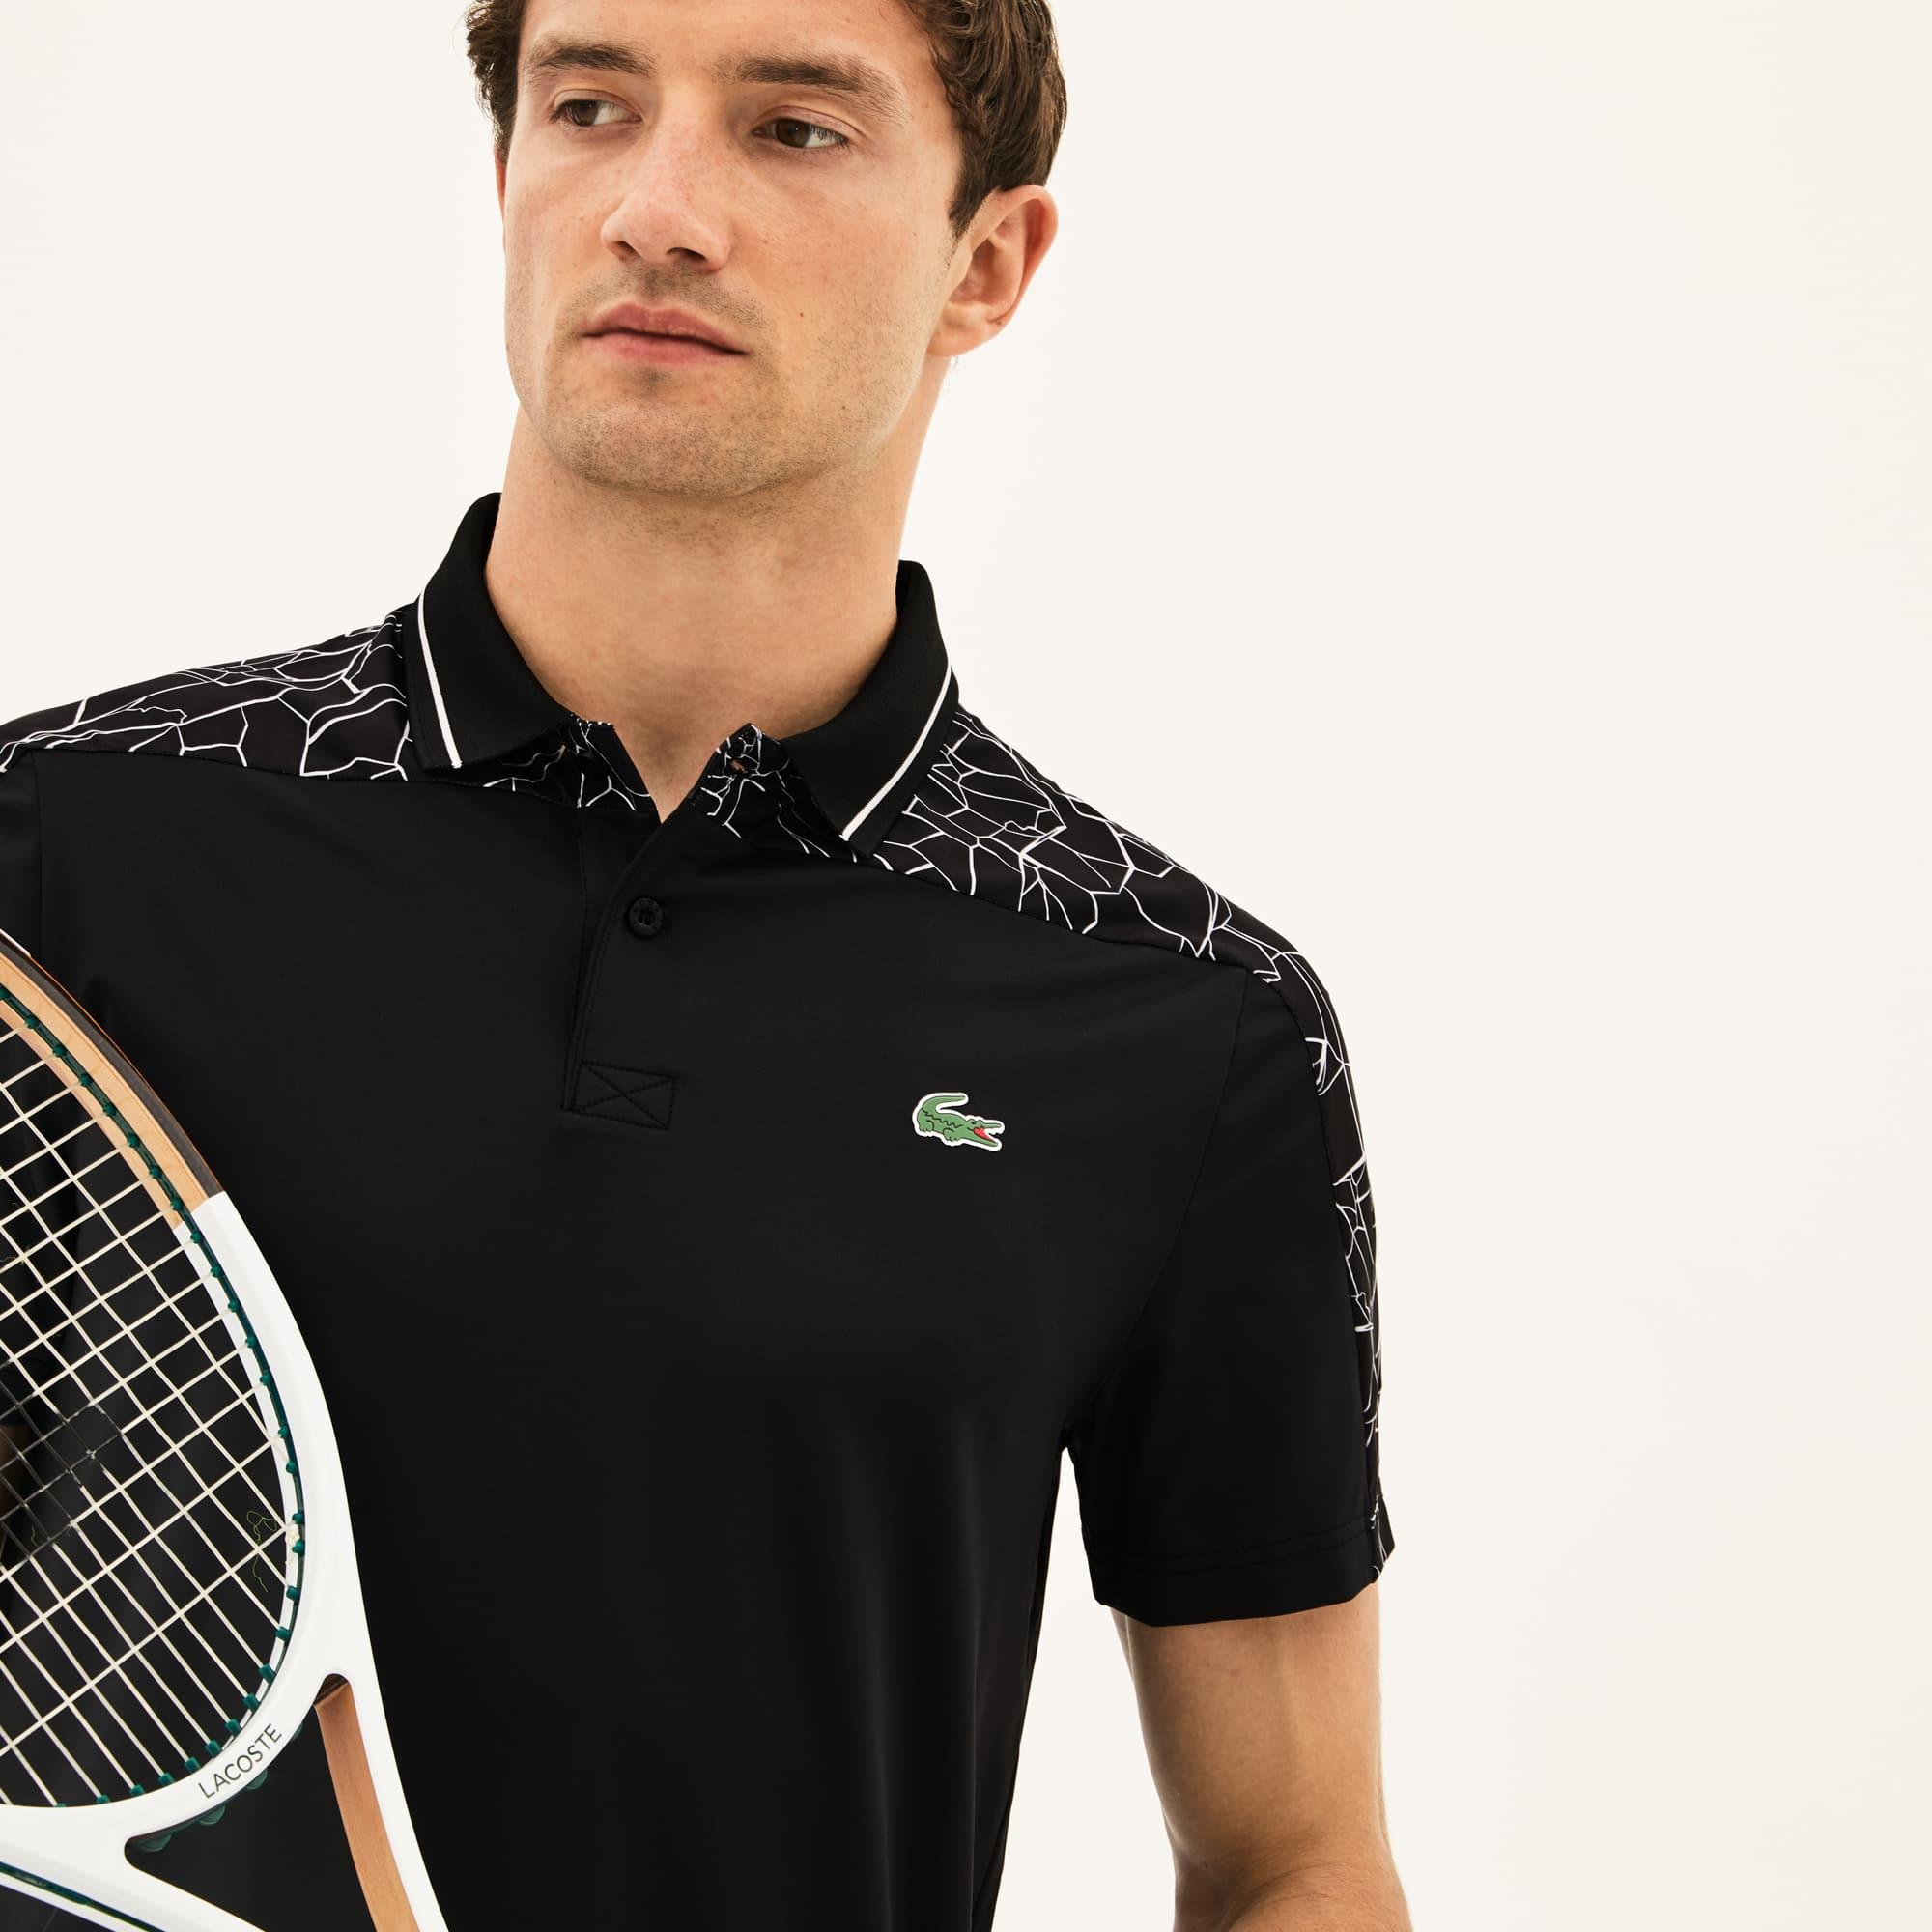 Men s Lacoste SPORT NOVAK DJOKOVIC-ON COURT COLLECTION Stretch Technical  Jersey Polo Shirt ... 0fad53d9b9